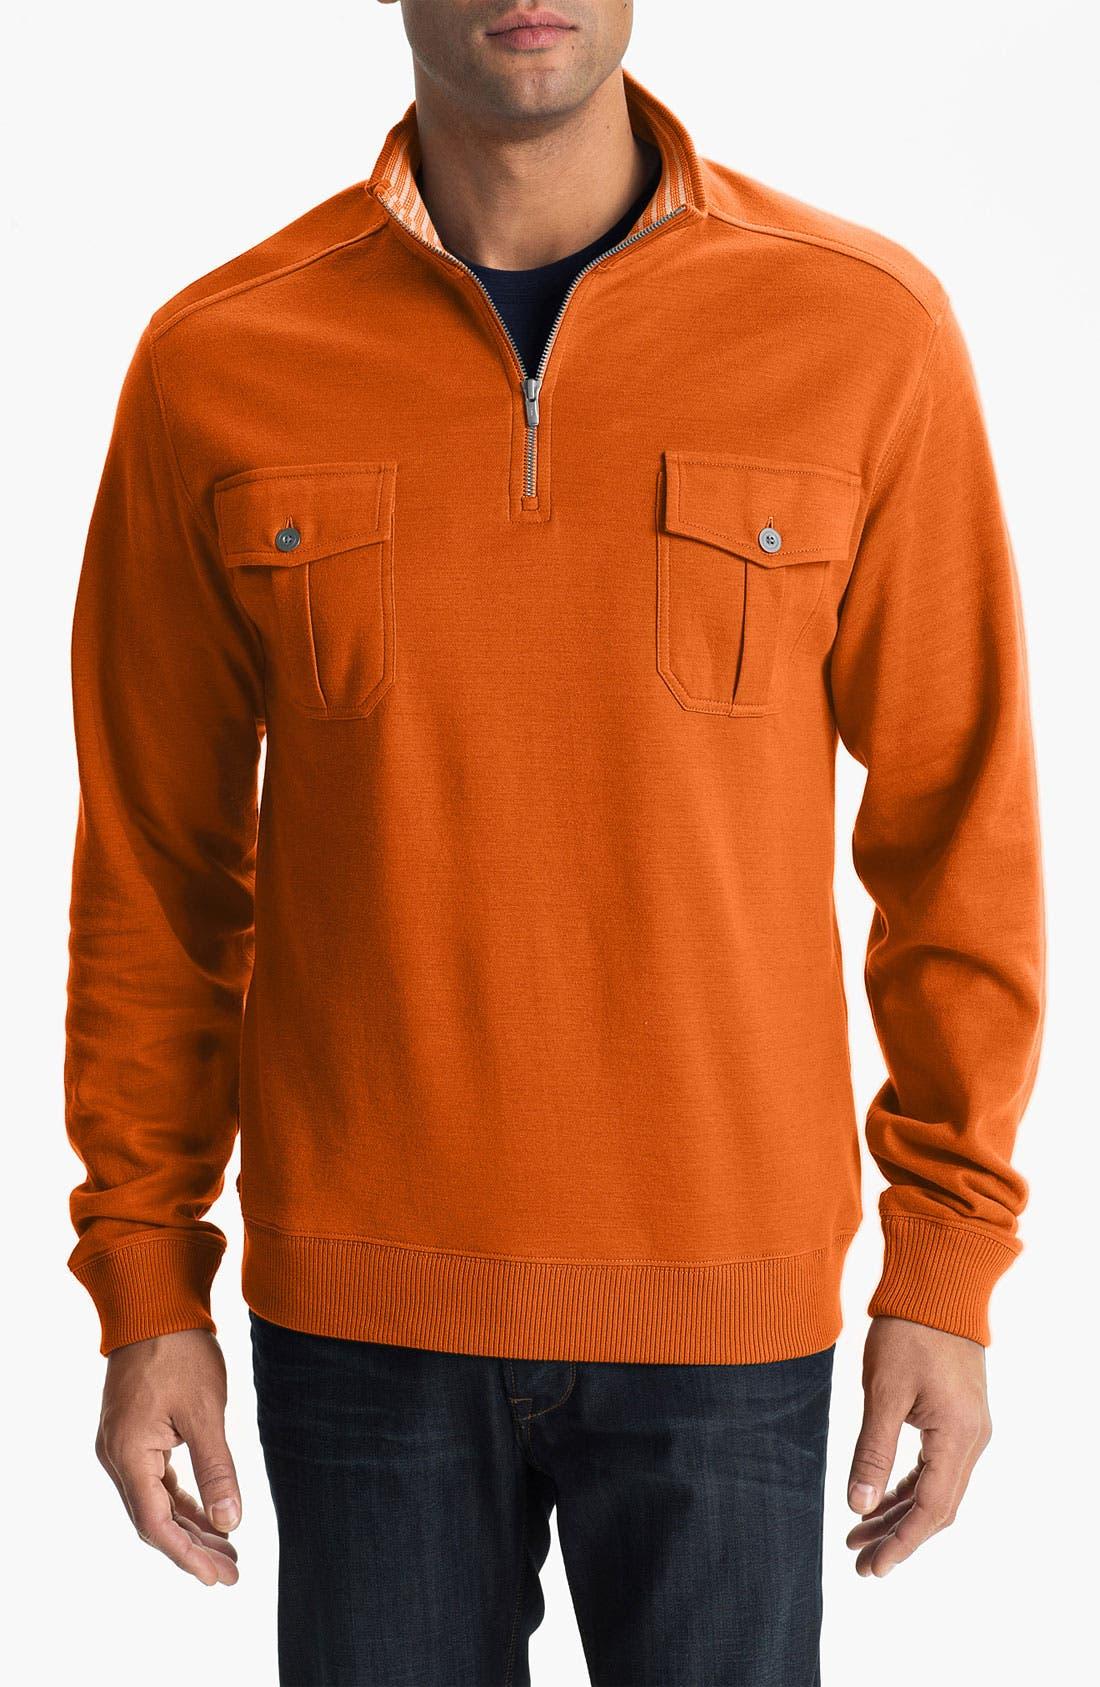 Alternate Image 1 Selected - Cutter & Buck 'Viewlands' Half Zip Pullover